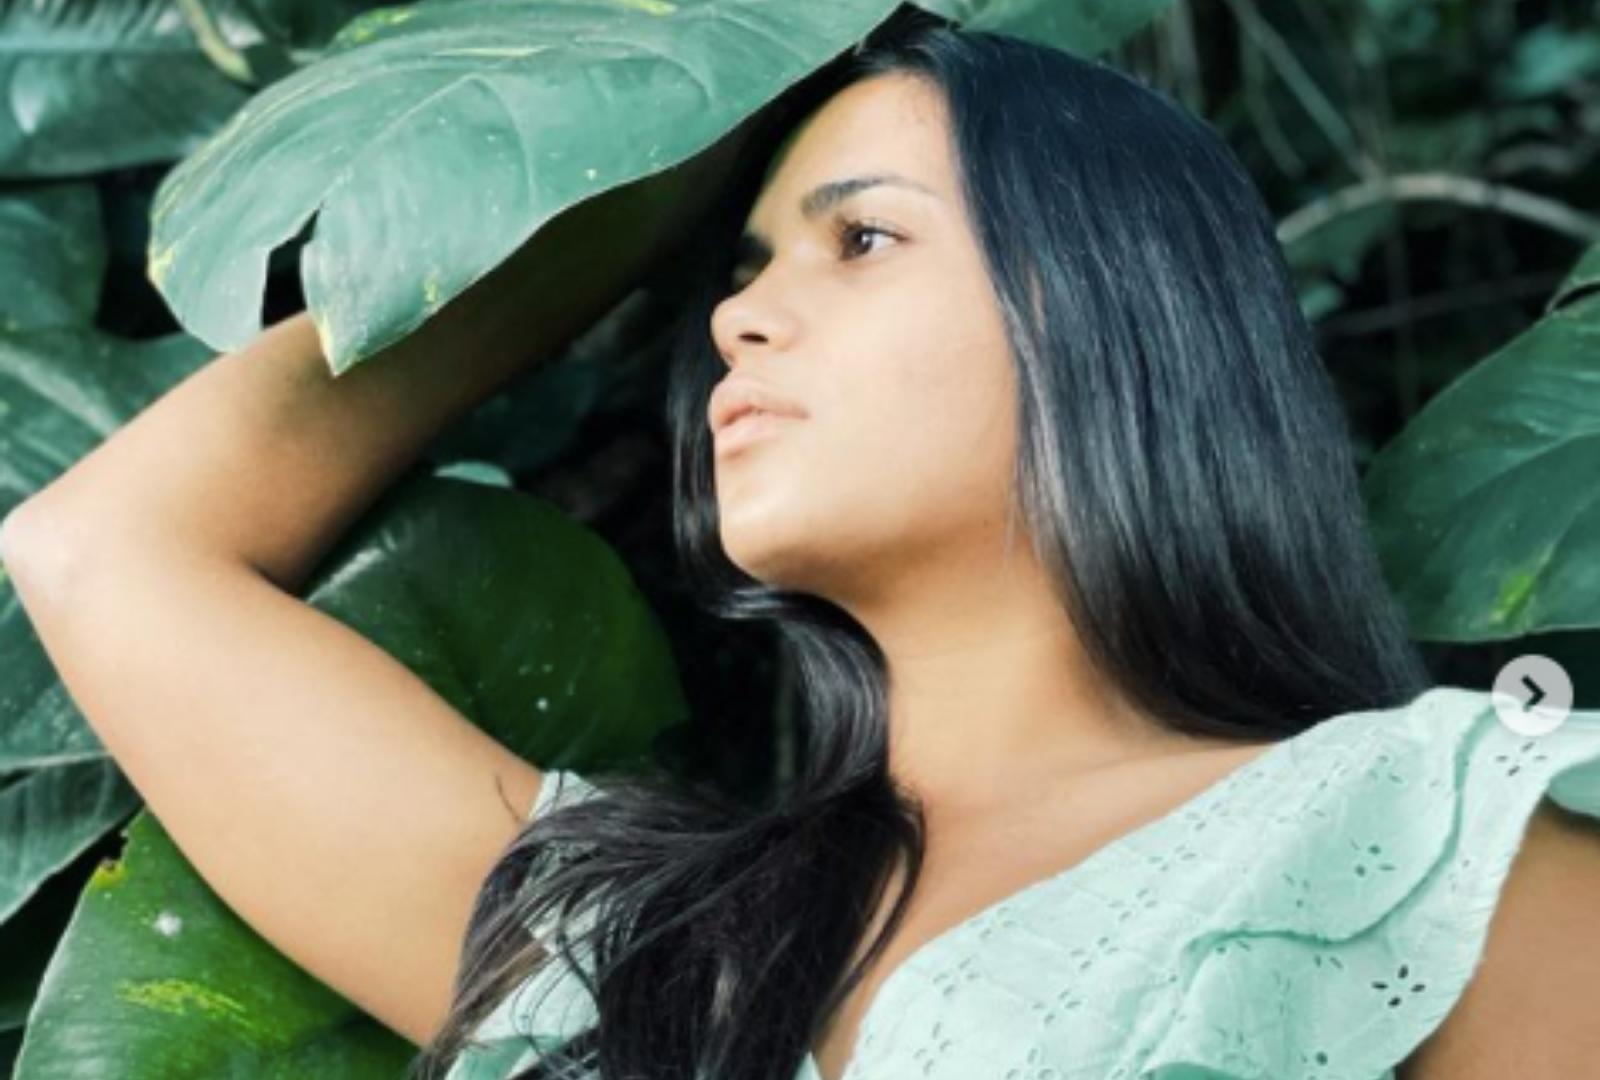 Latina, Boricua and a Biotechnologist progressing the Cannabis Industry